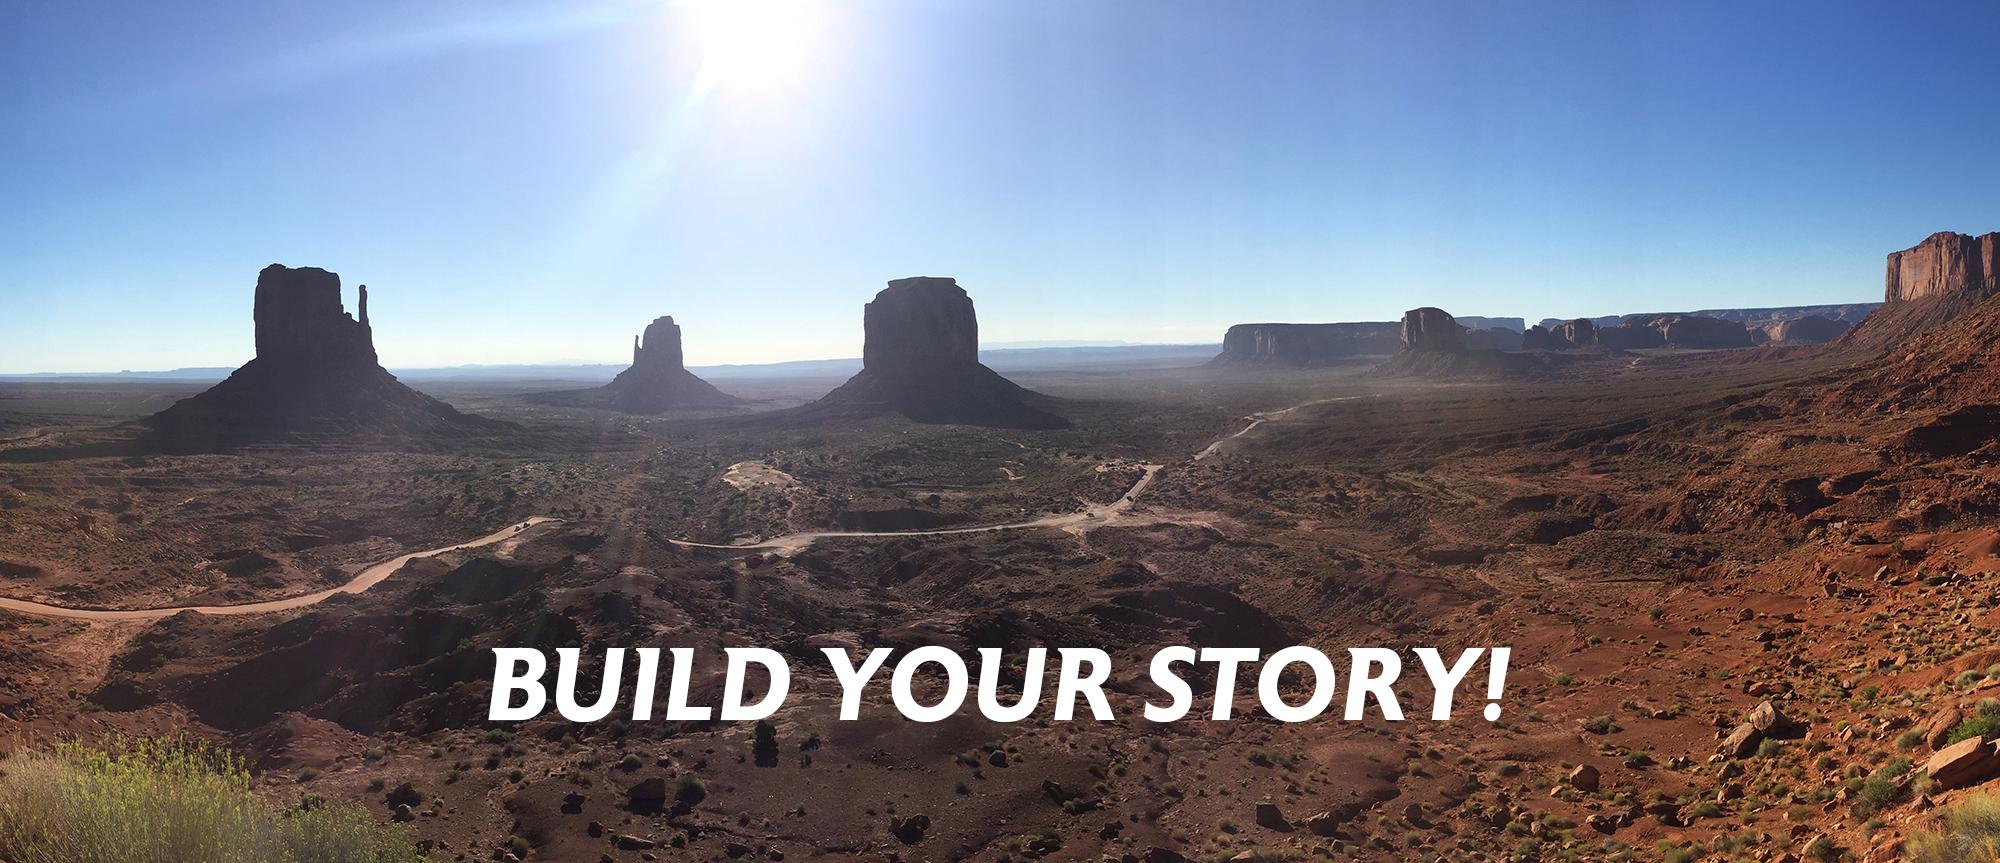 Monument Valley, U.S. - 2017